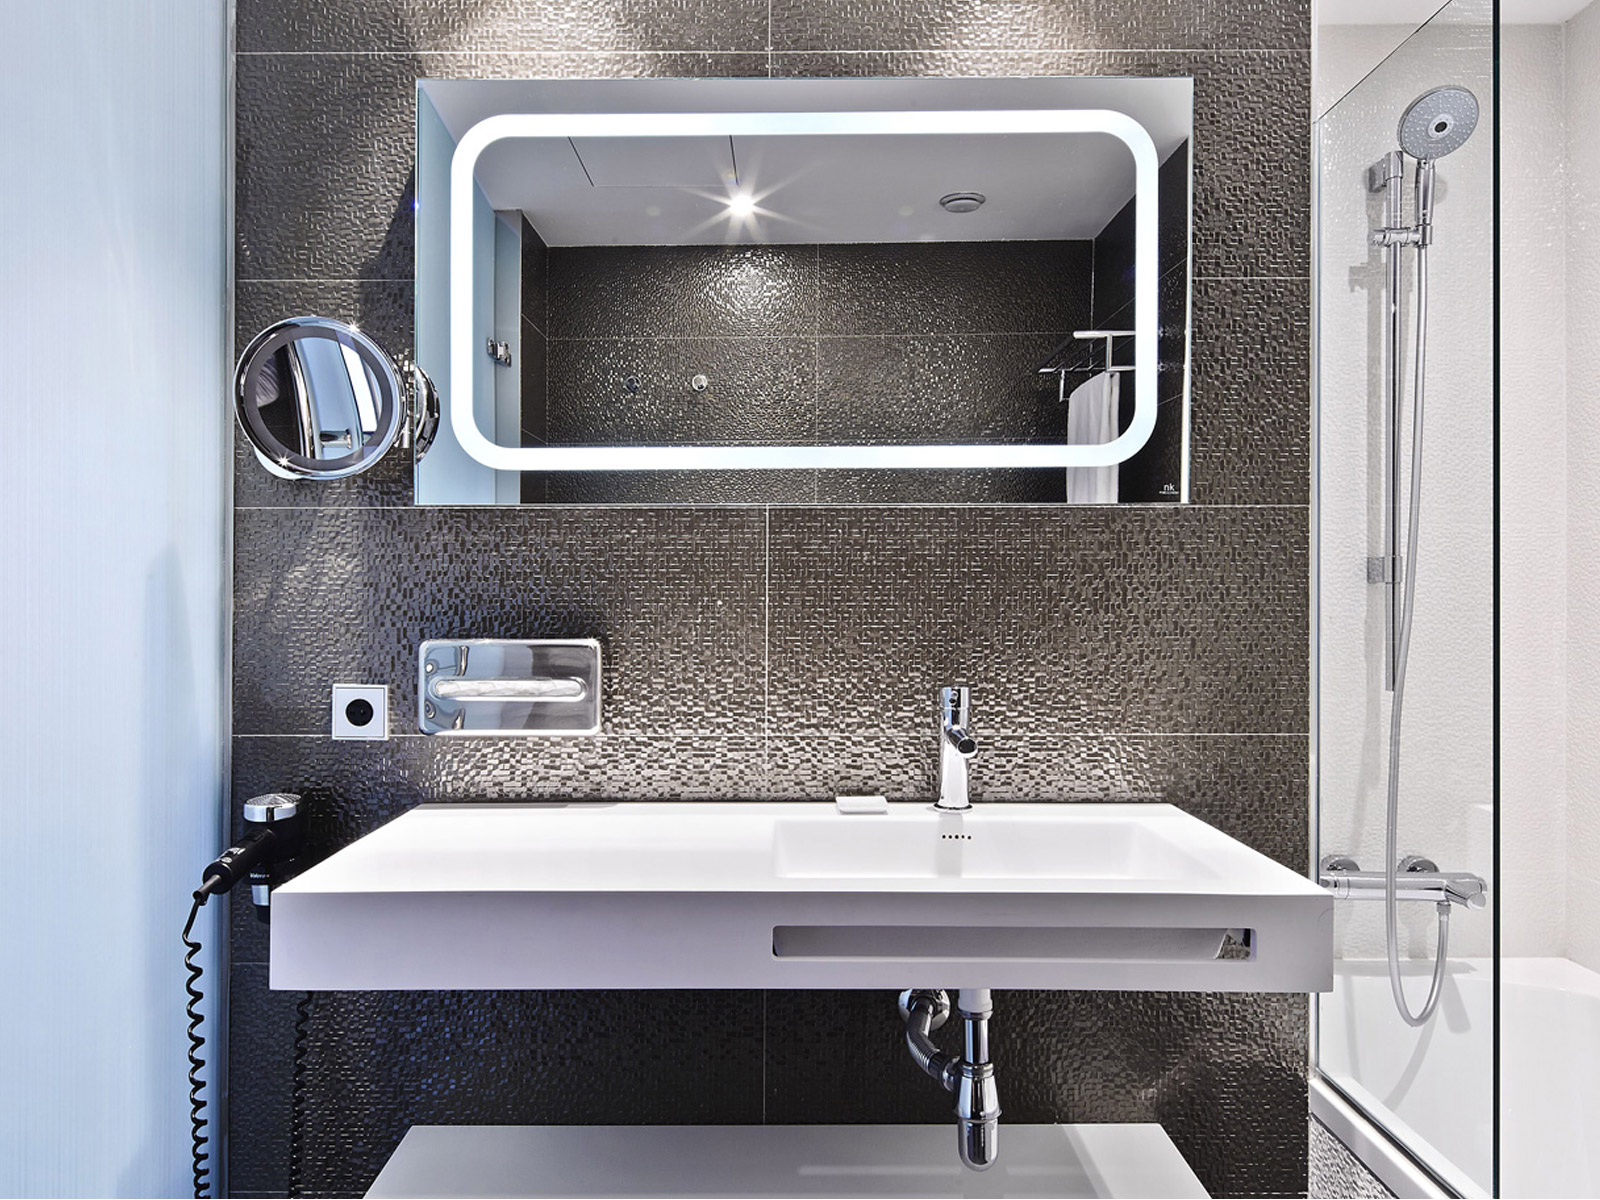 Rooms Hotel Barcelona Gala - Vincci Hotels - Double Room